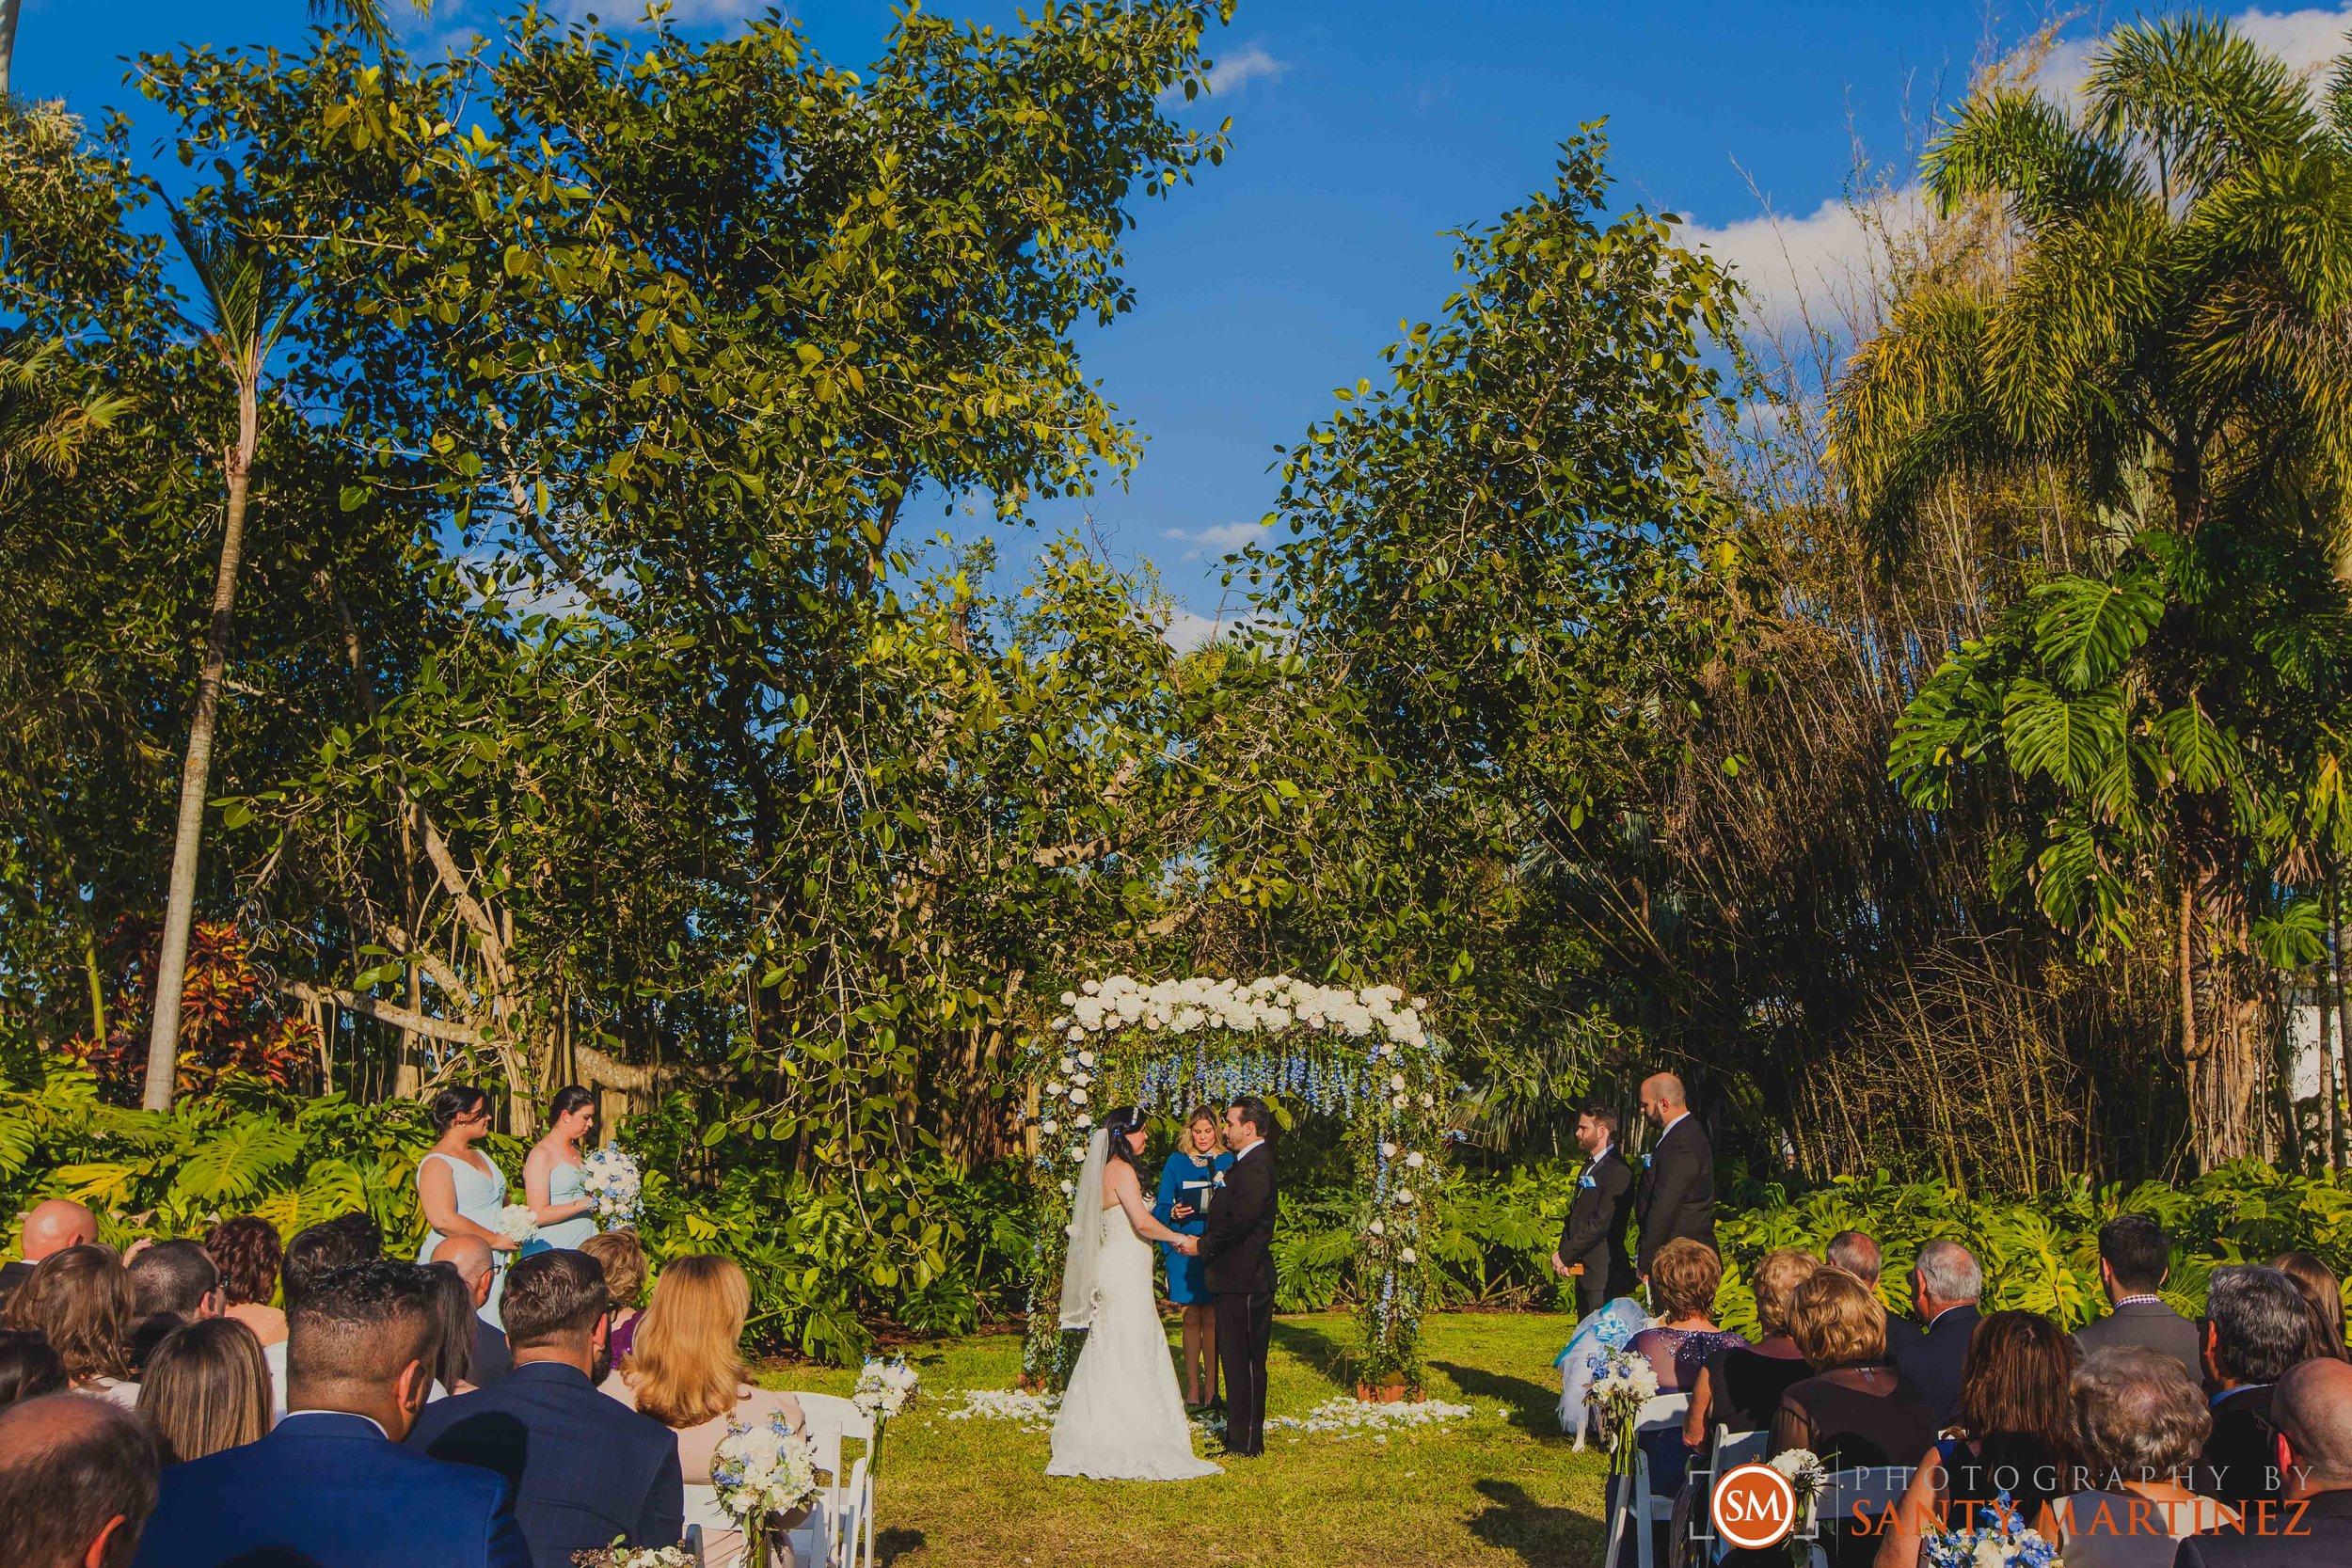 Wedding - Whimsical key West House - Photography by Santy Martinez-19.jpg